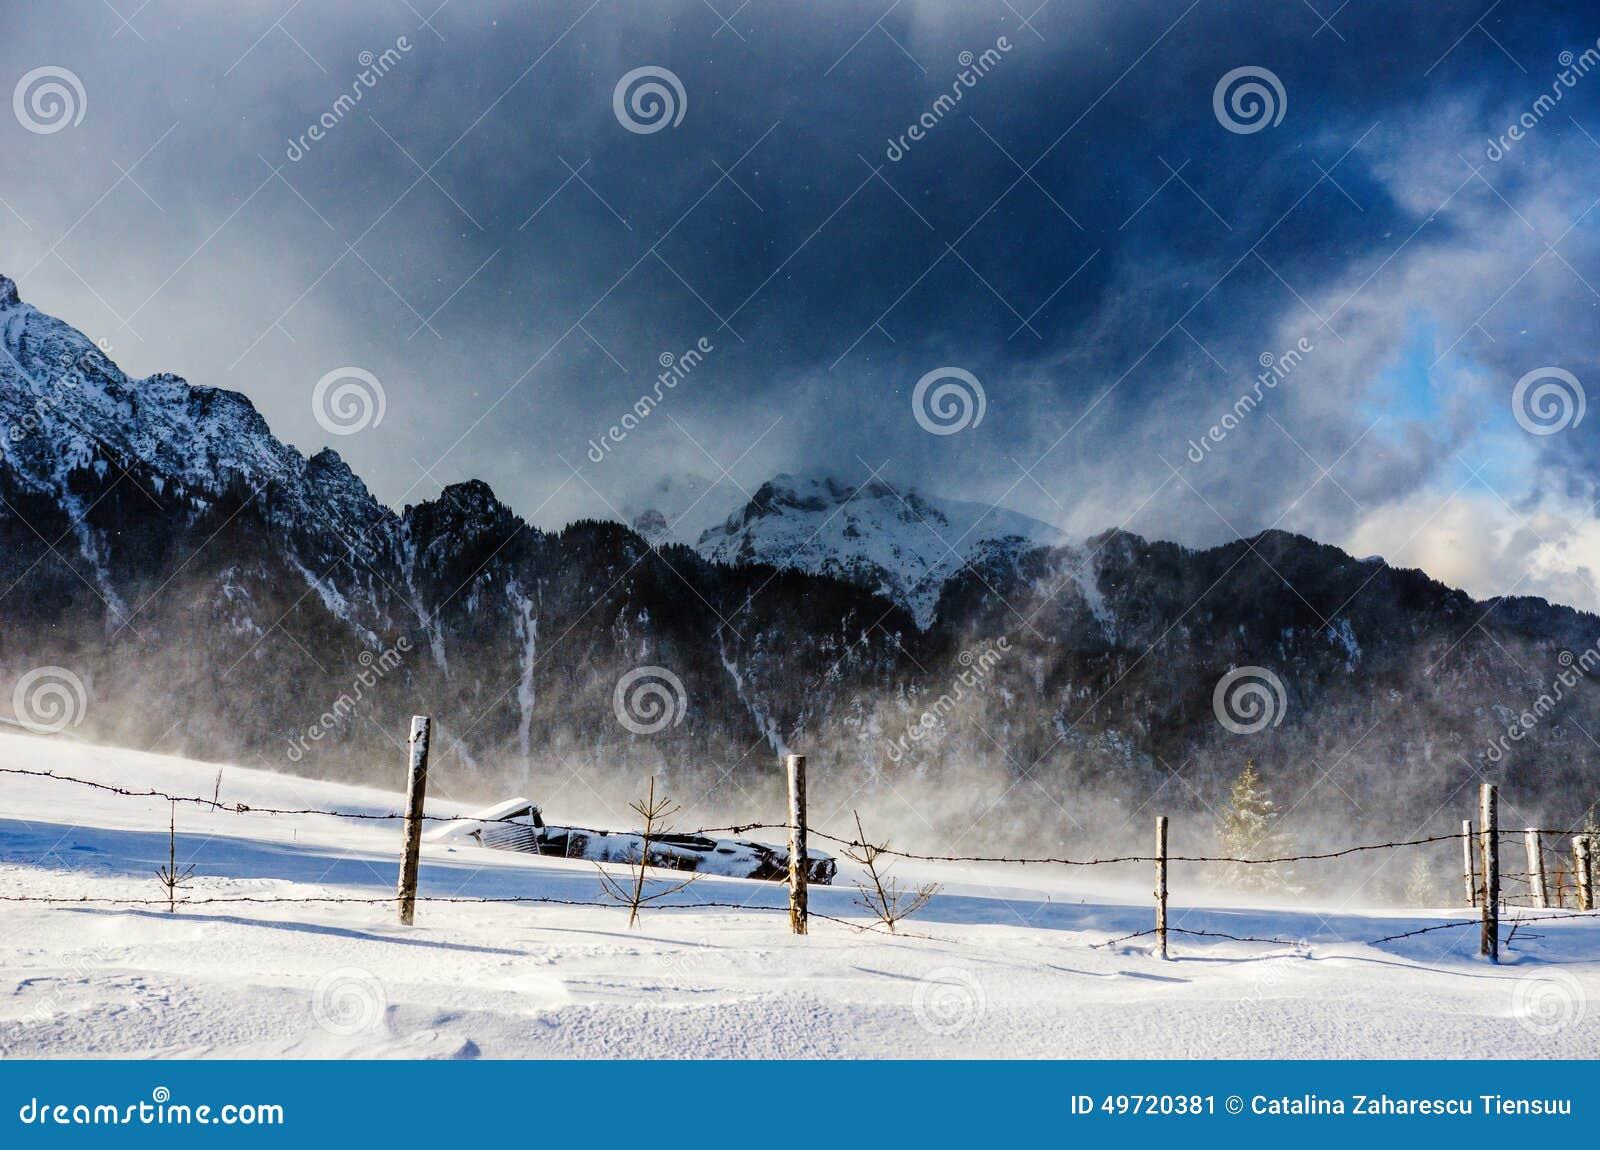 Snow storm in Carpathian mountains